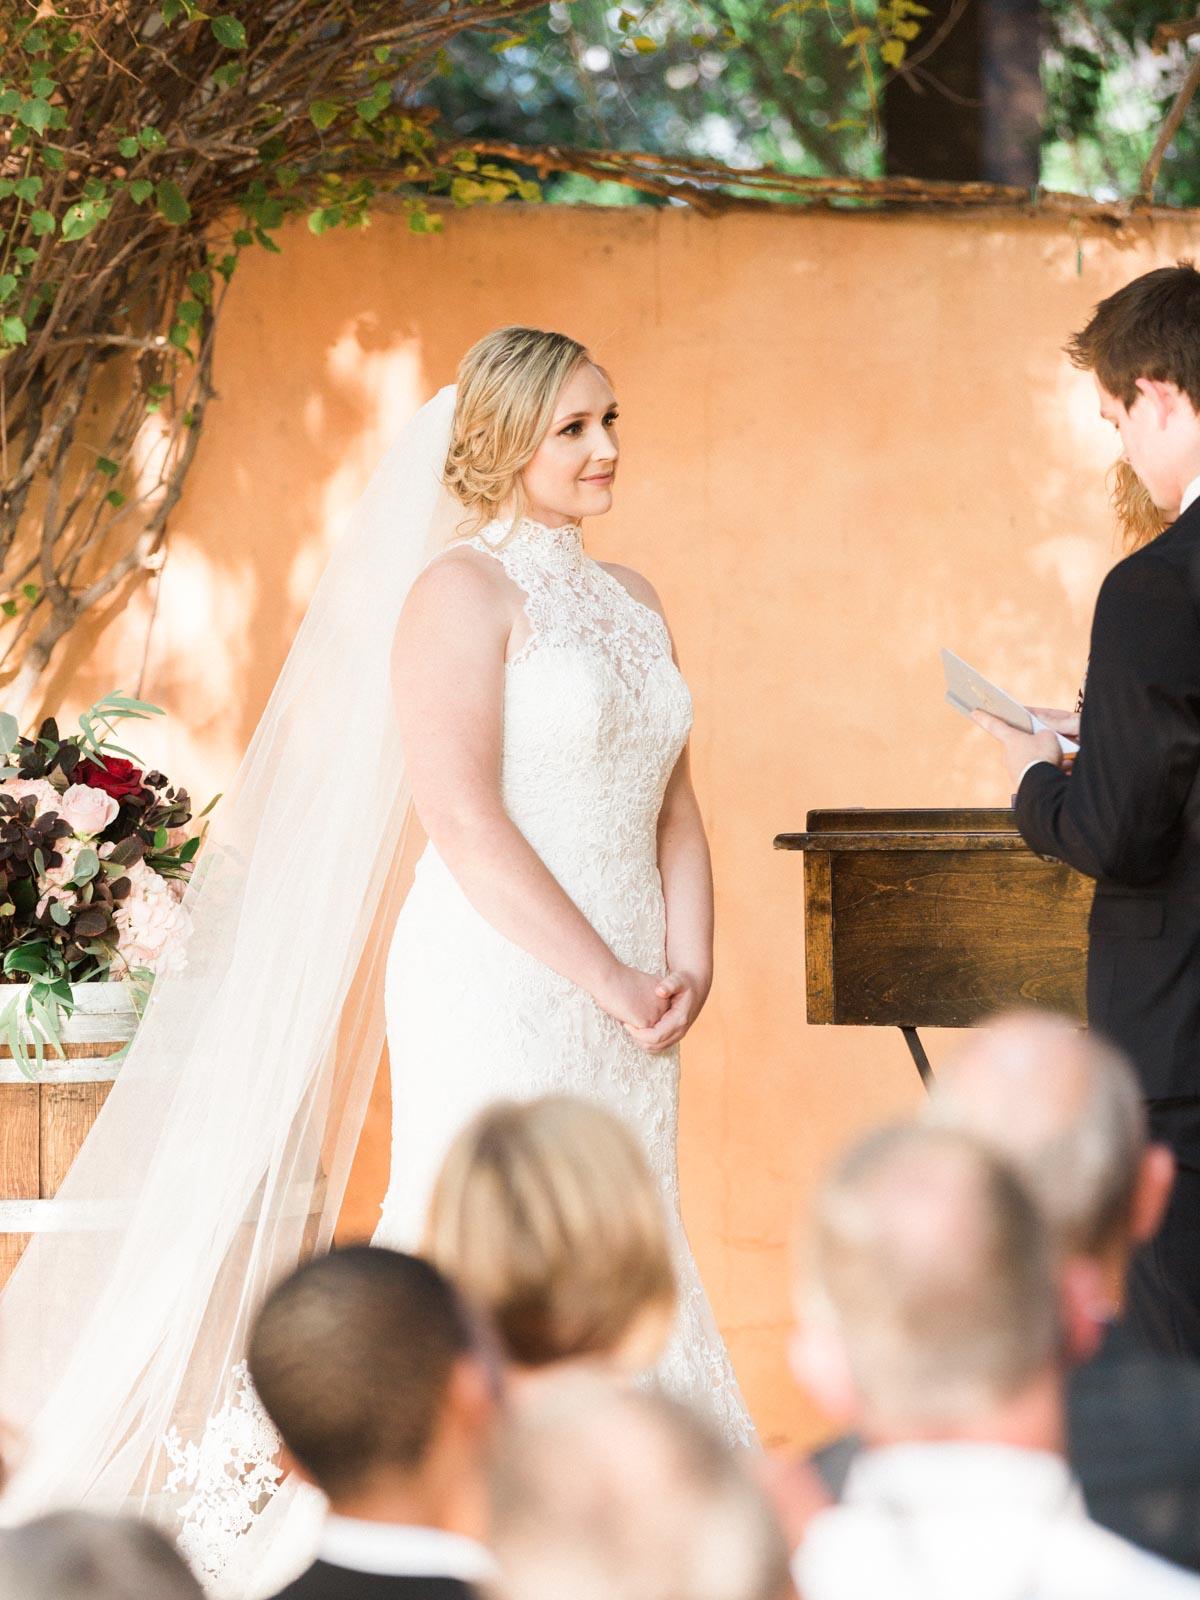 wedding-ceremony-bride-smiling.jpg